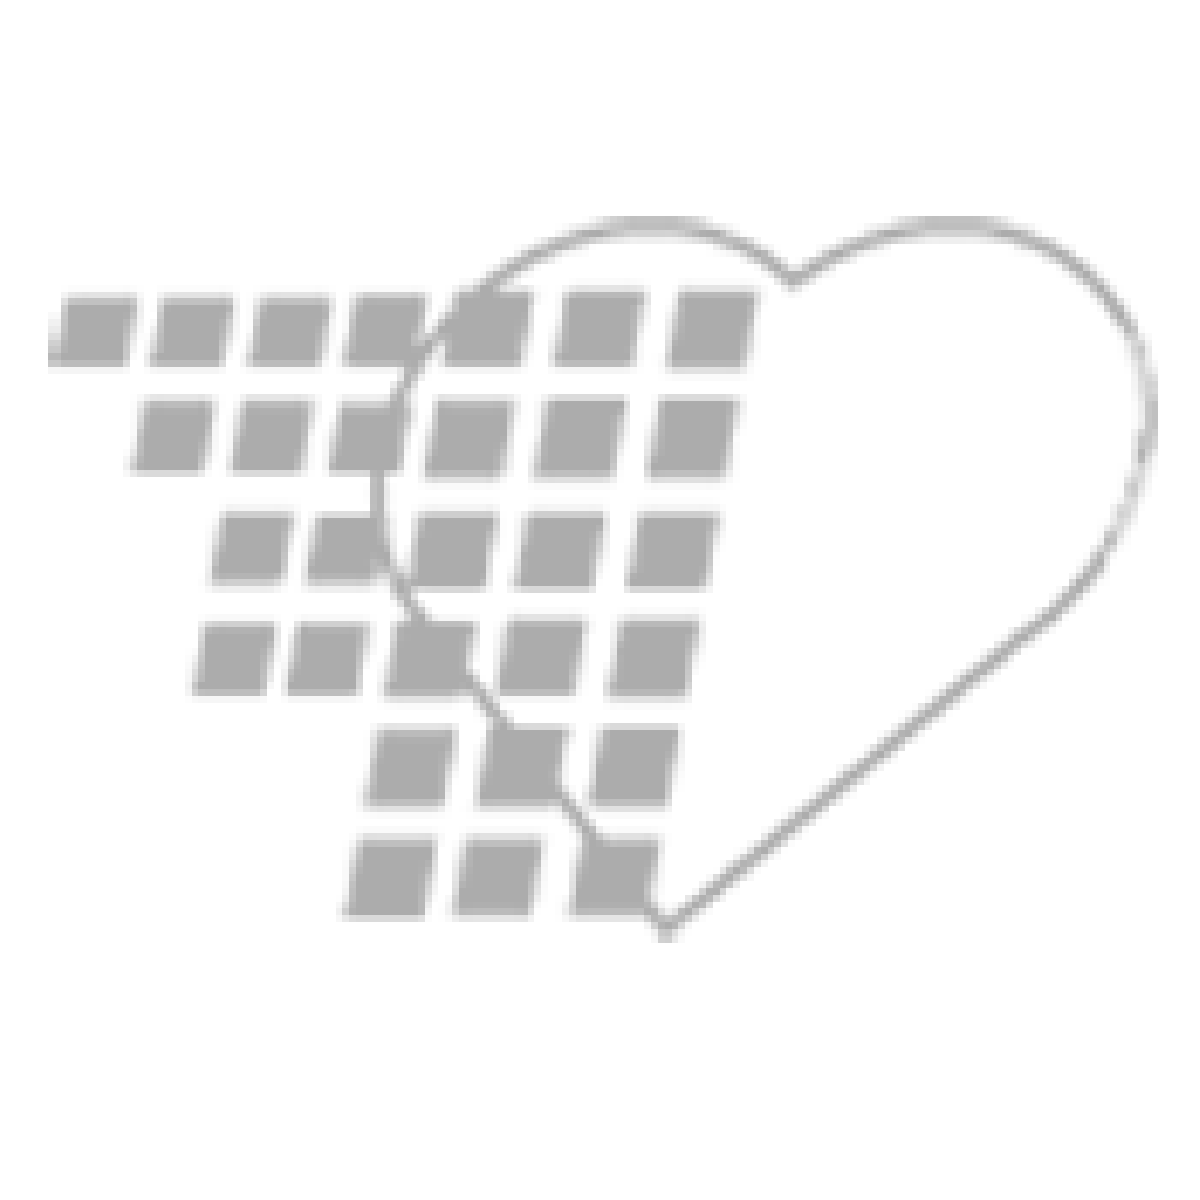 06-54-7469 - Tevadaptor Spike Port Adaptor Set with ULTRASITE Needless Valve